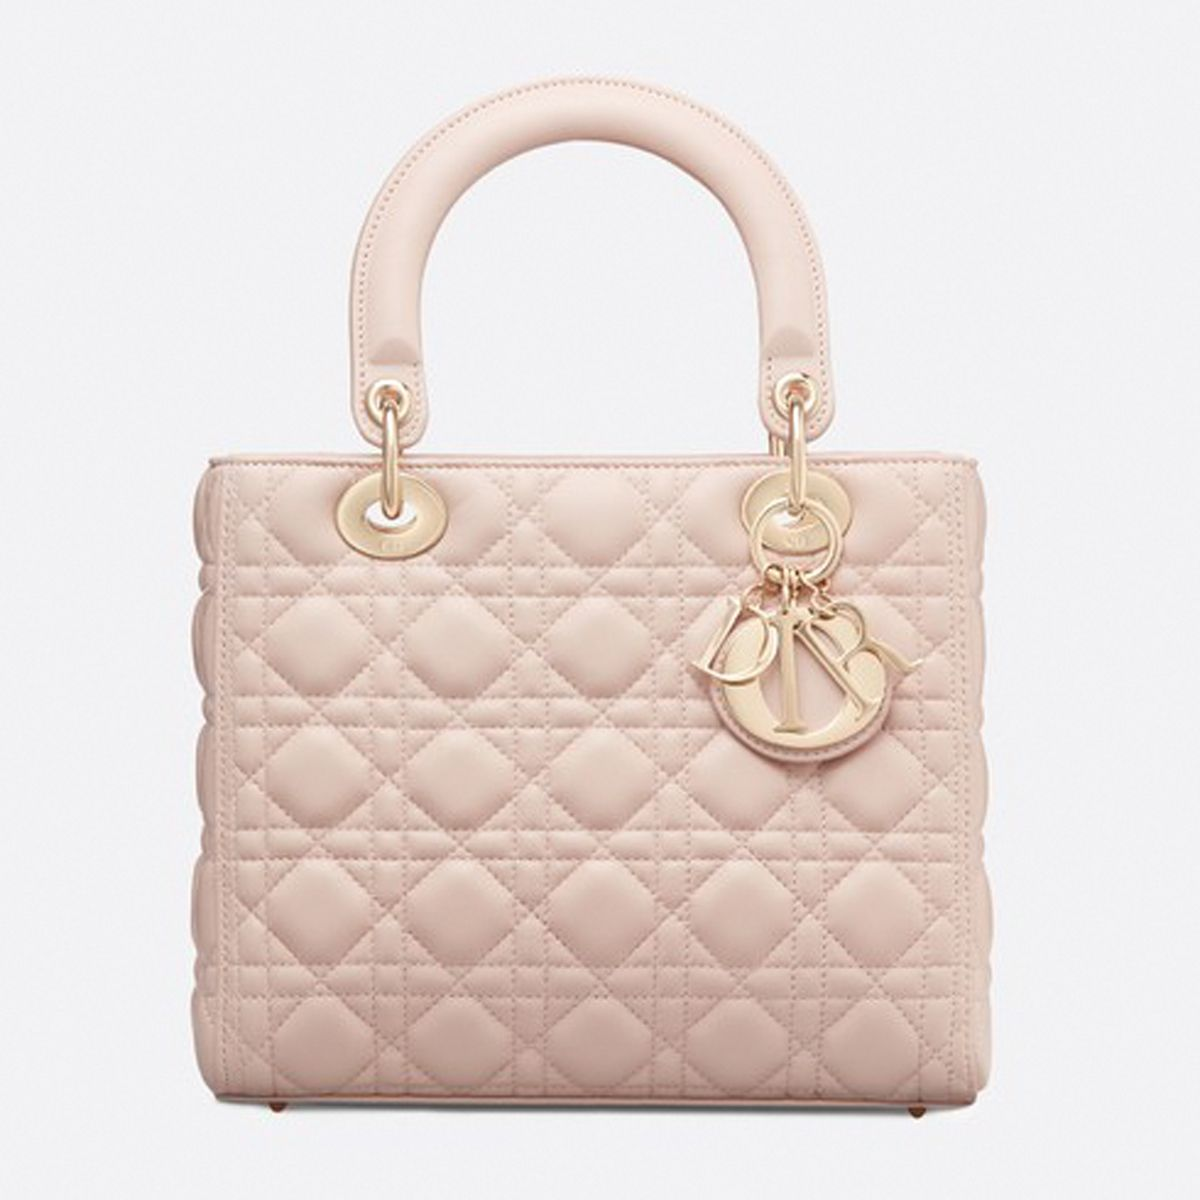 classic-designer-handbag-brands-271996-1541601315722-product.1200x0c.jpg (1200×1200)